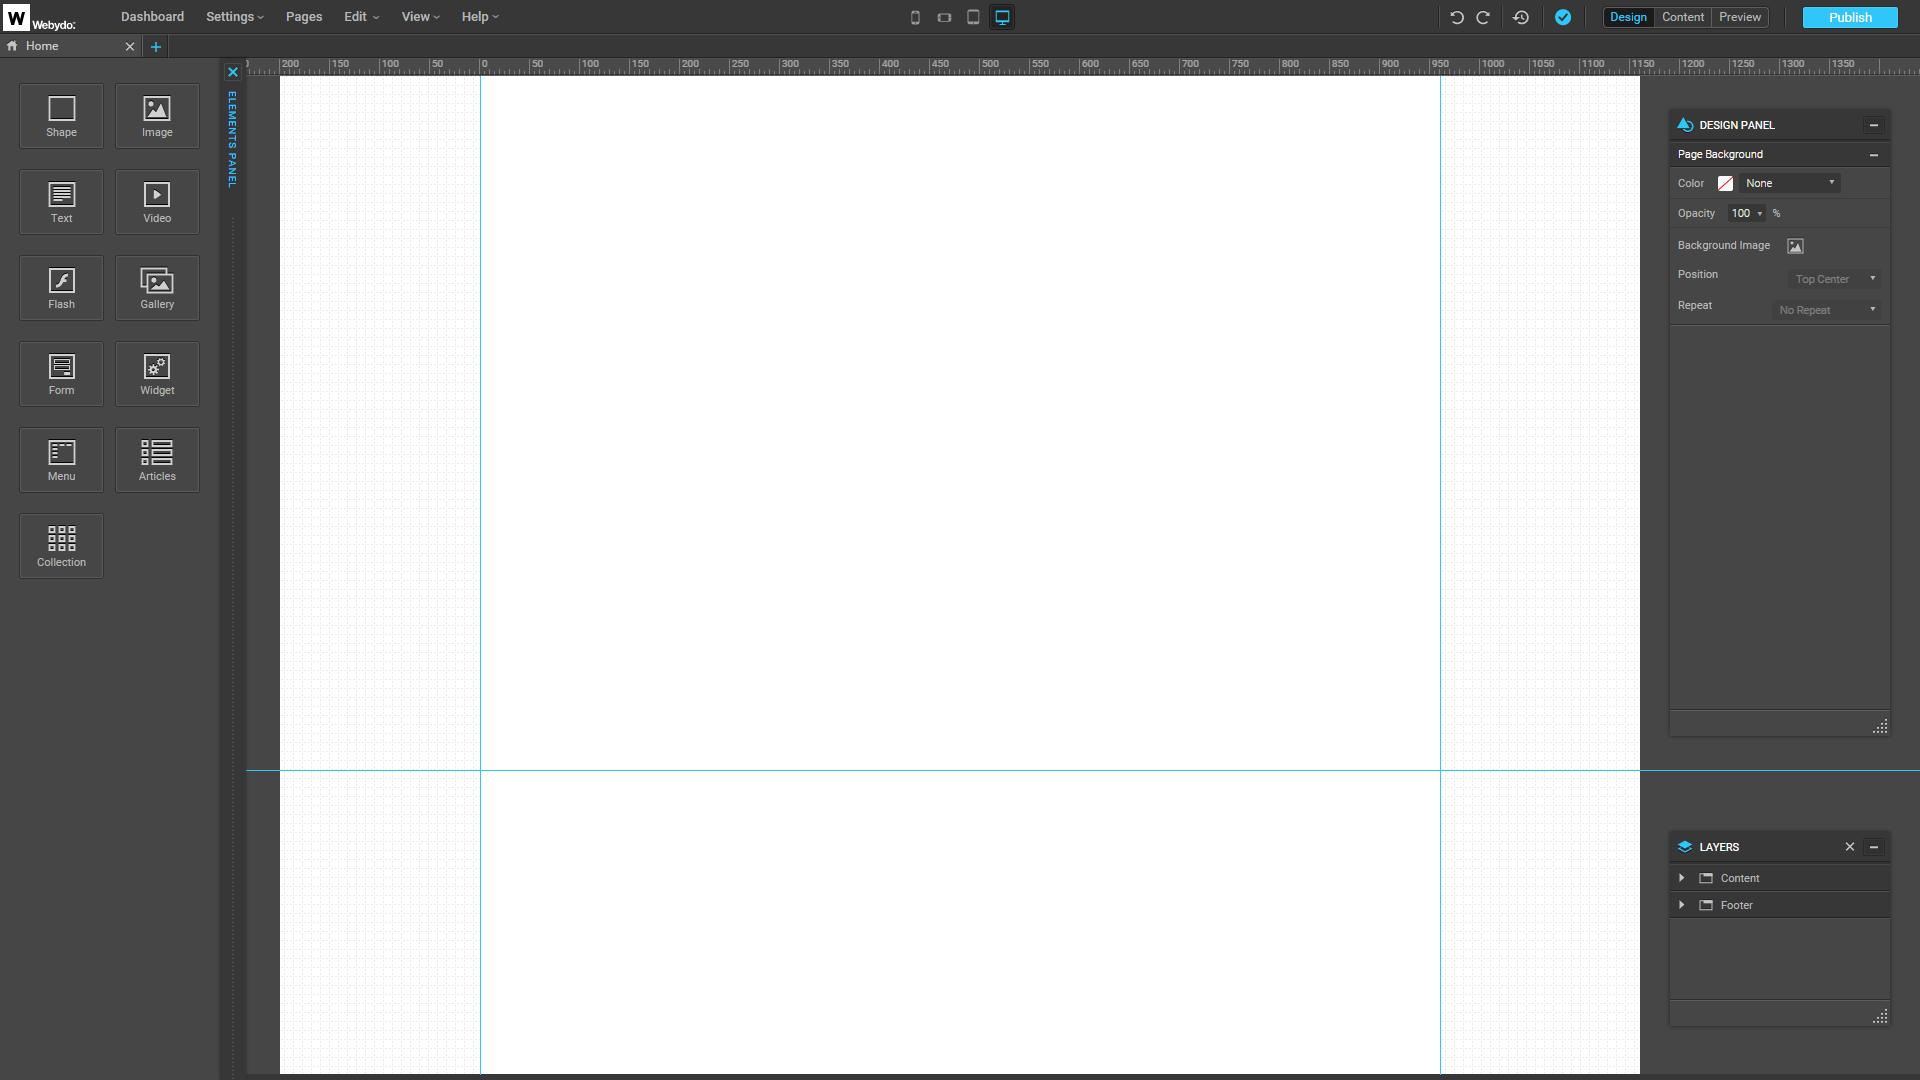 New Webydo Design from Scratch